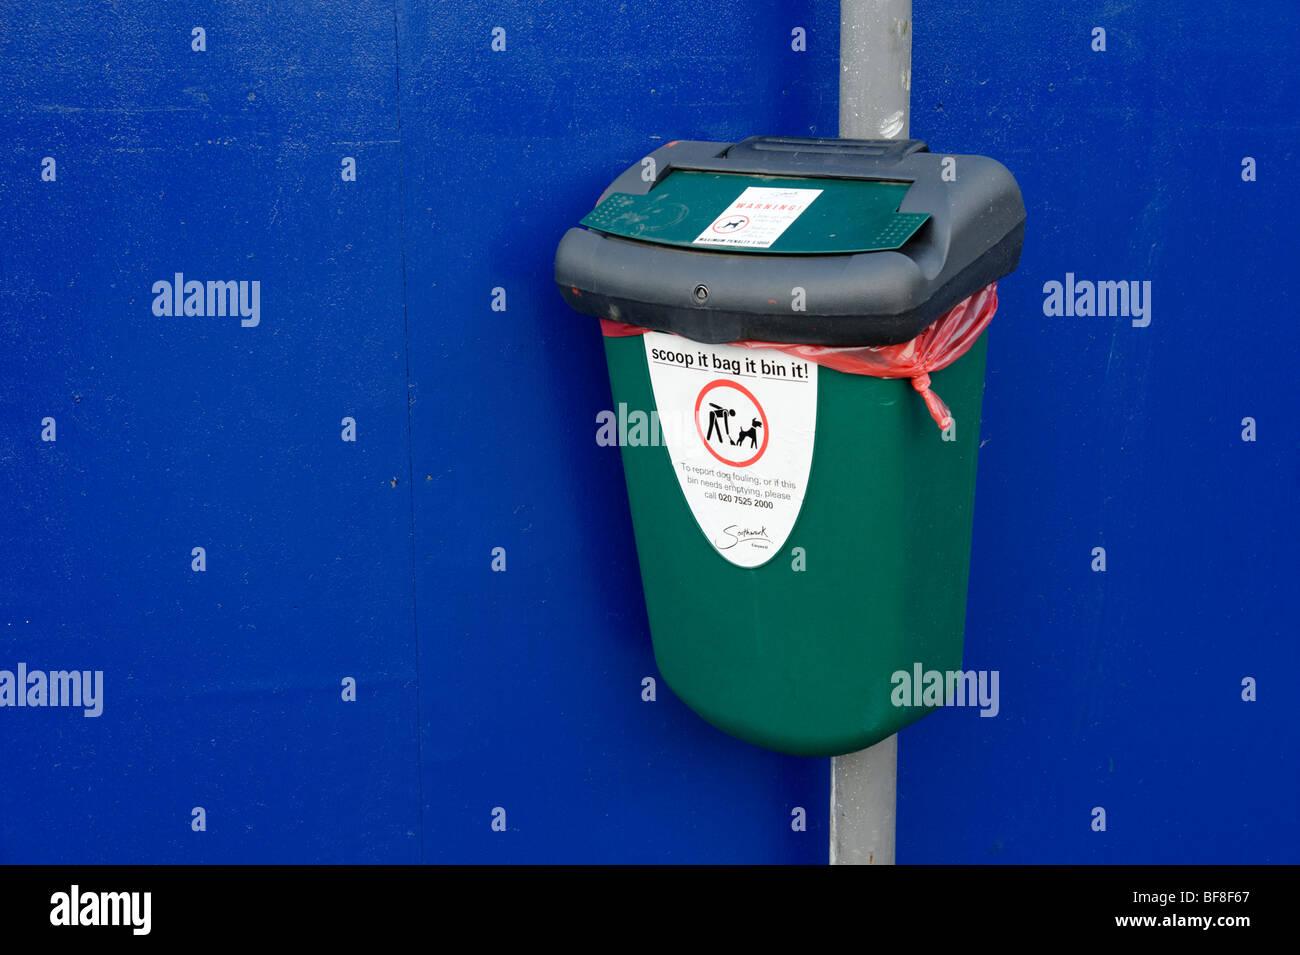 Dog waste bin. London. UK 2009. - Stock Image